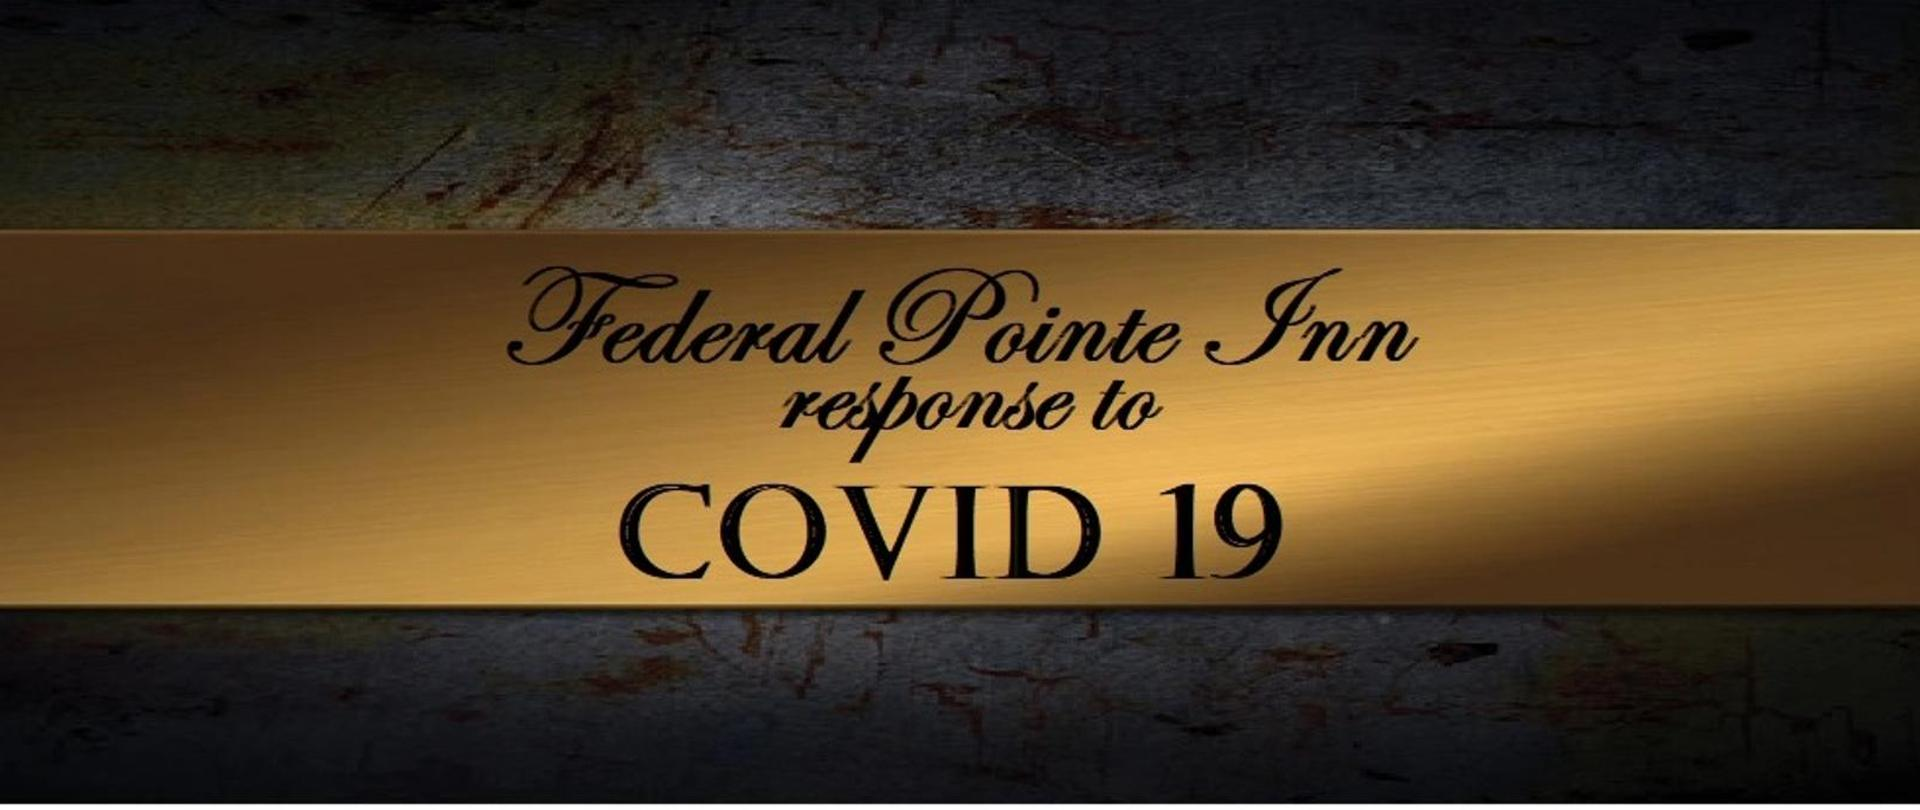 covid 19 response.jpg